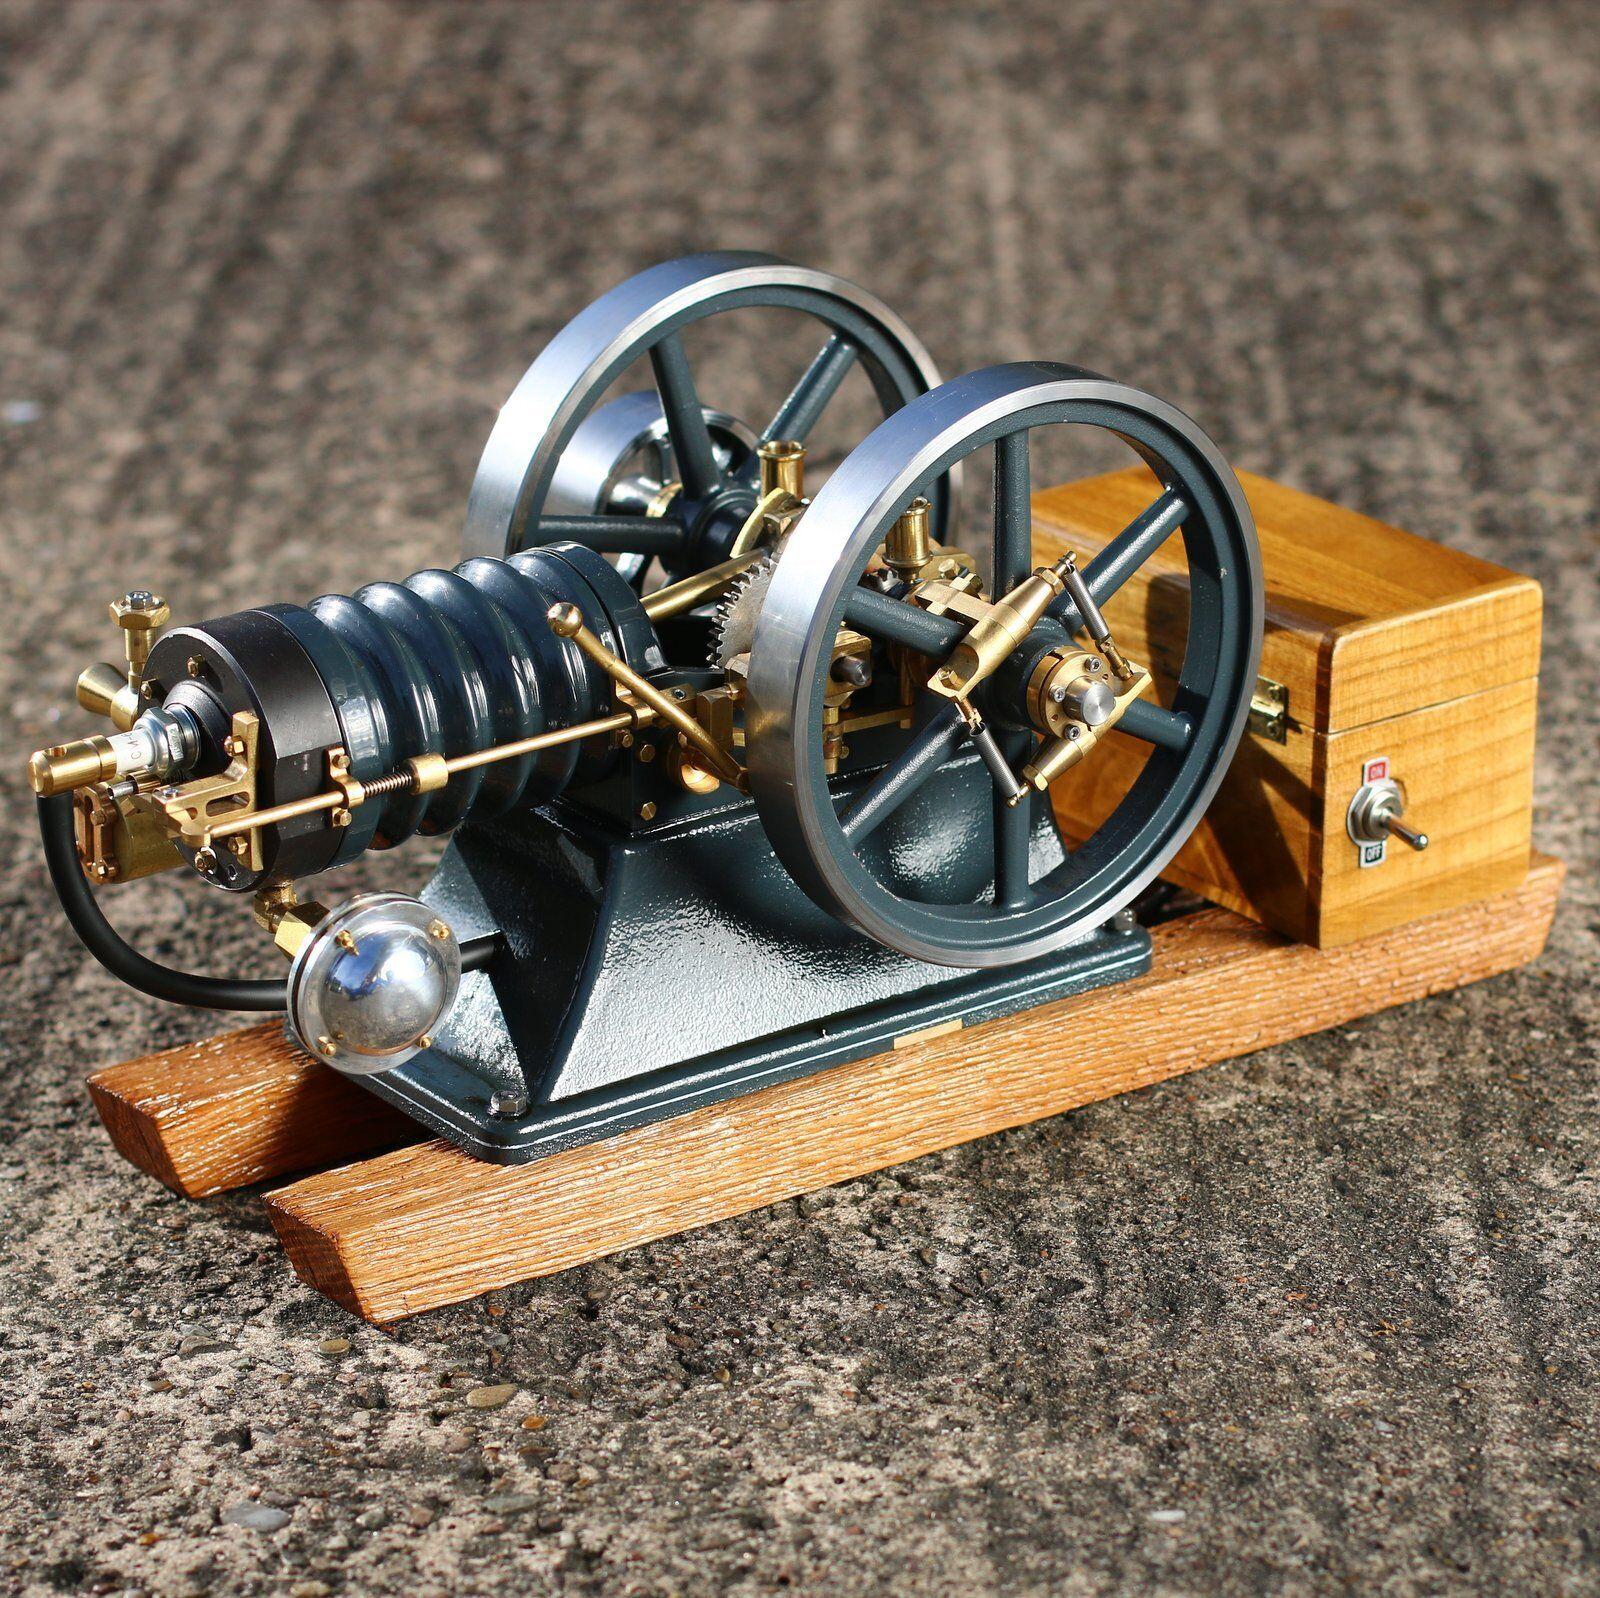 Stationärmotor  Karl  material kit modellbau motor con hit and miss régimen